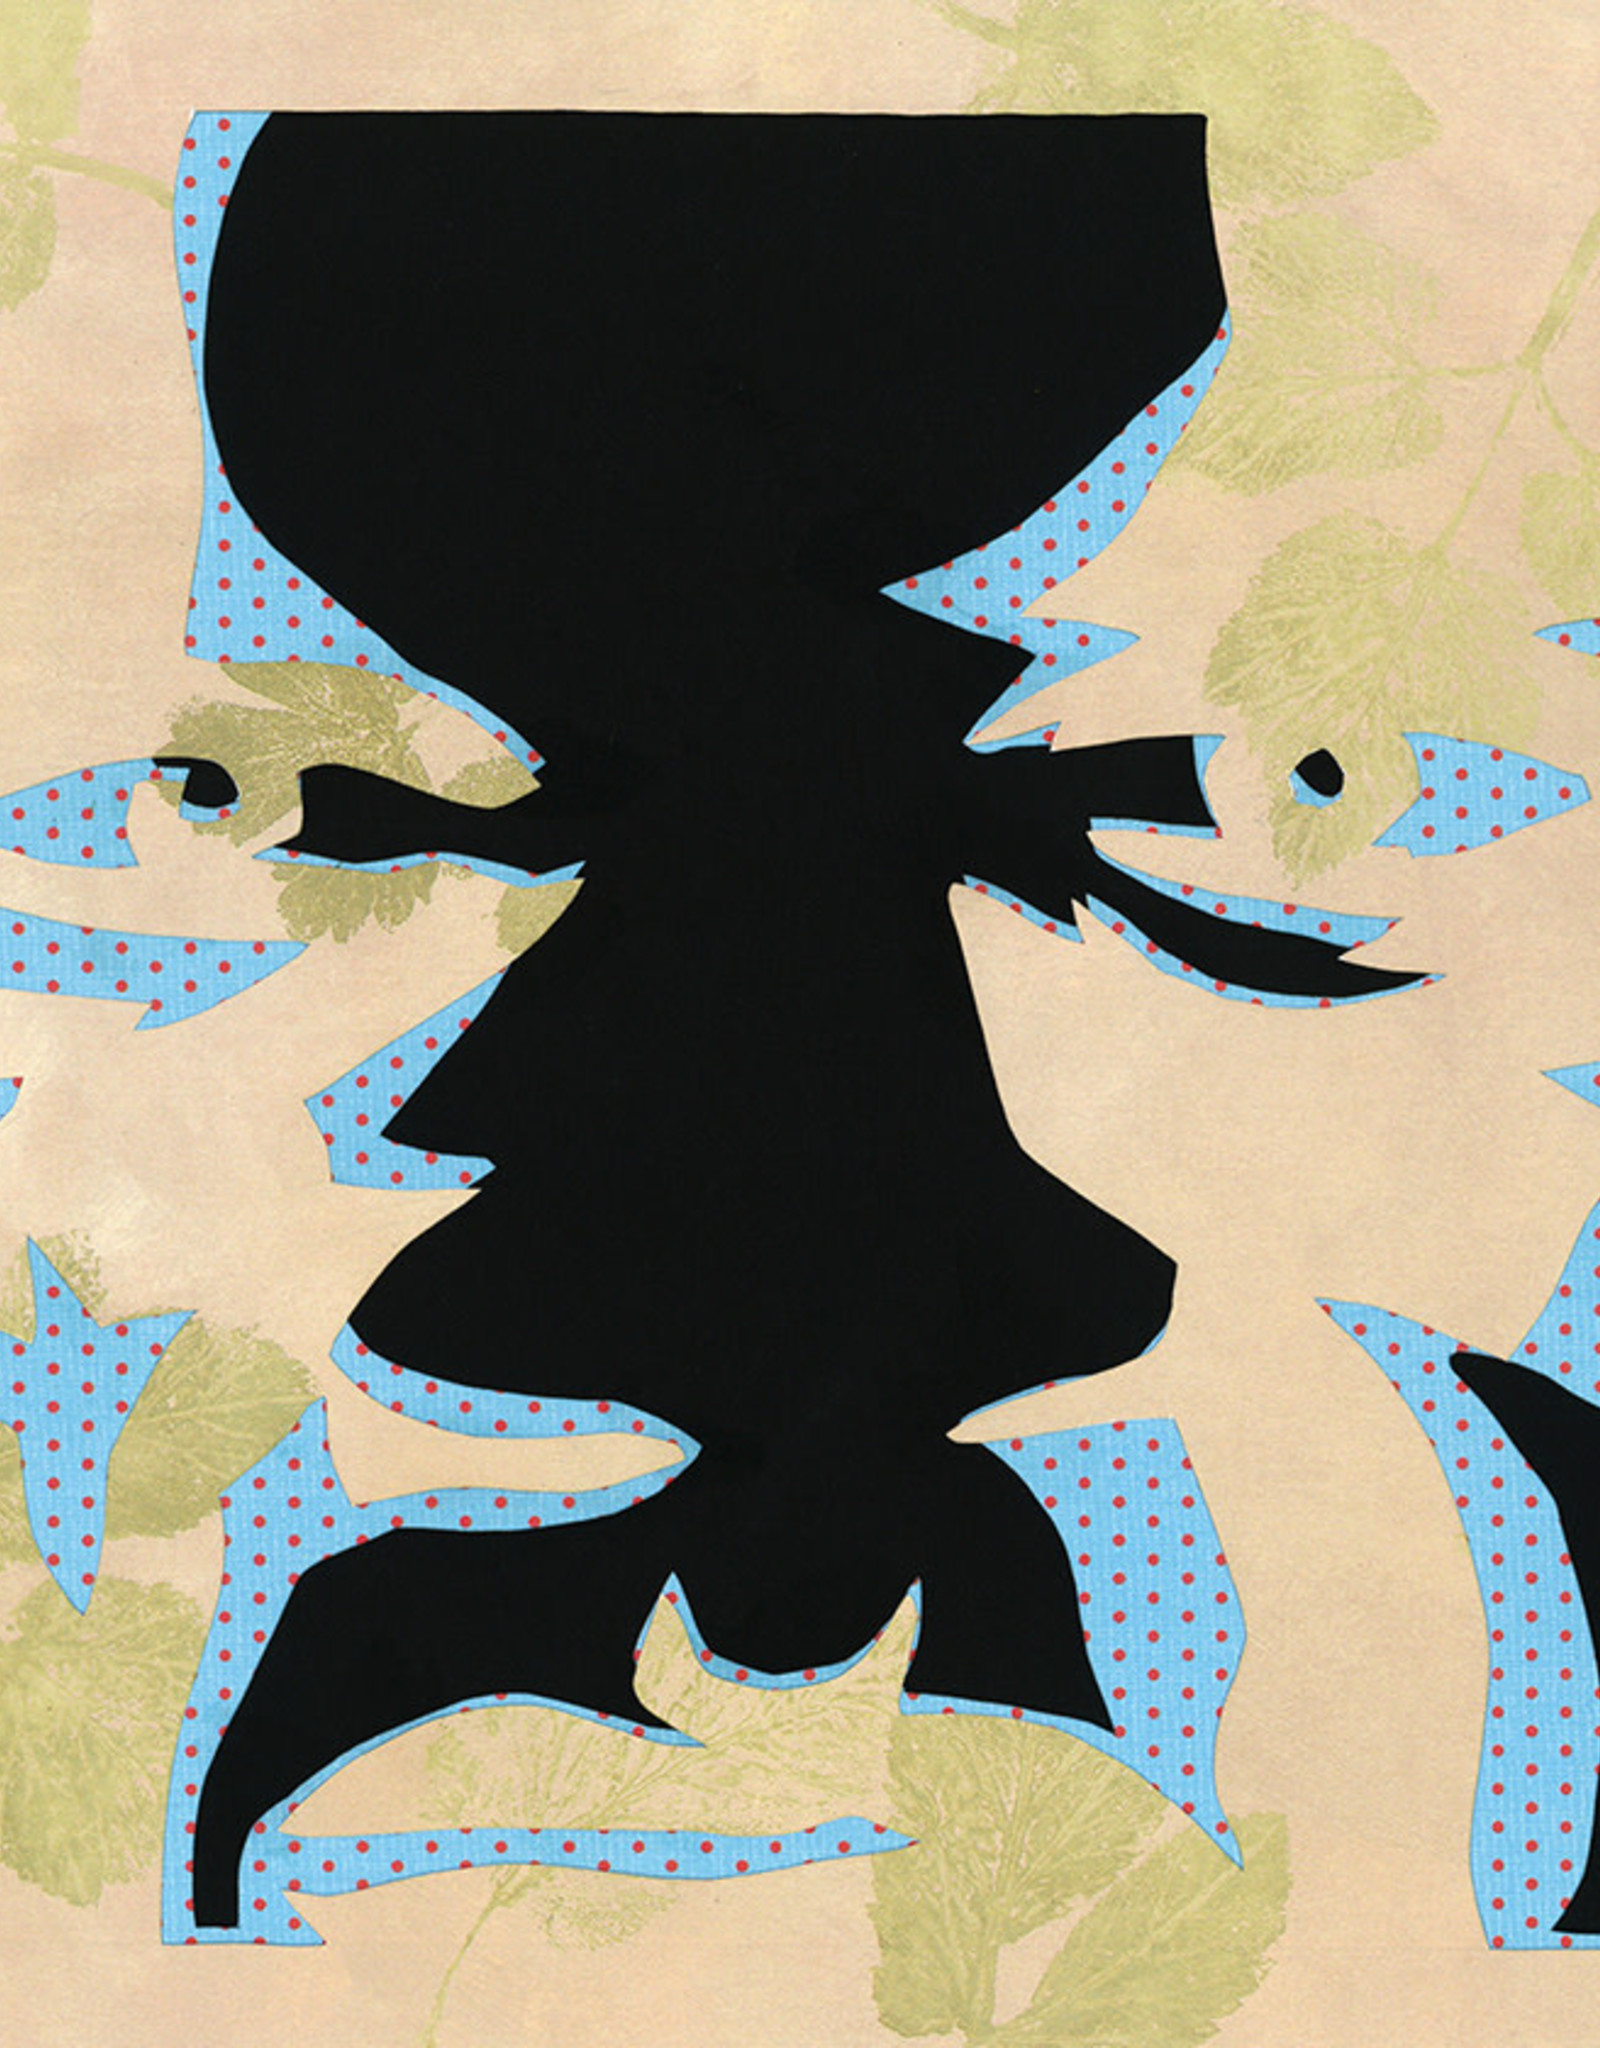 Gray Jones Face to Face -Cutout 9x12 #44